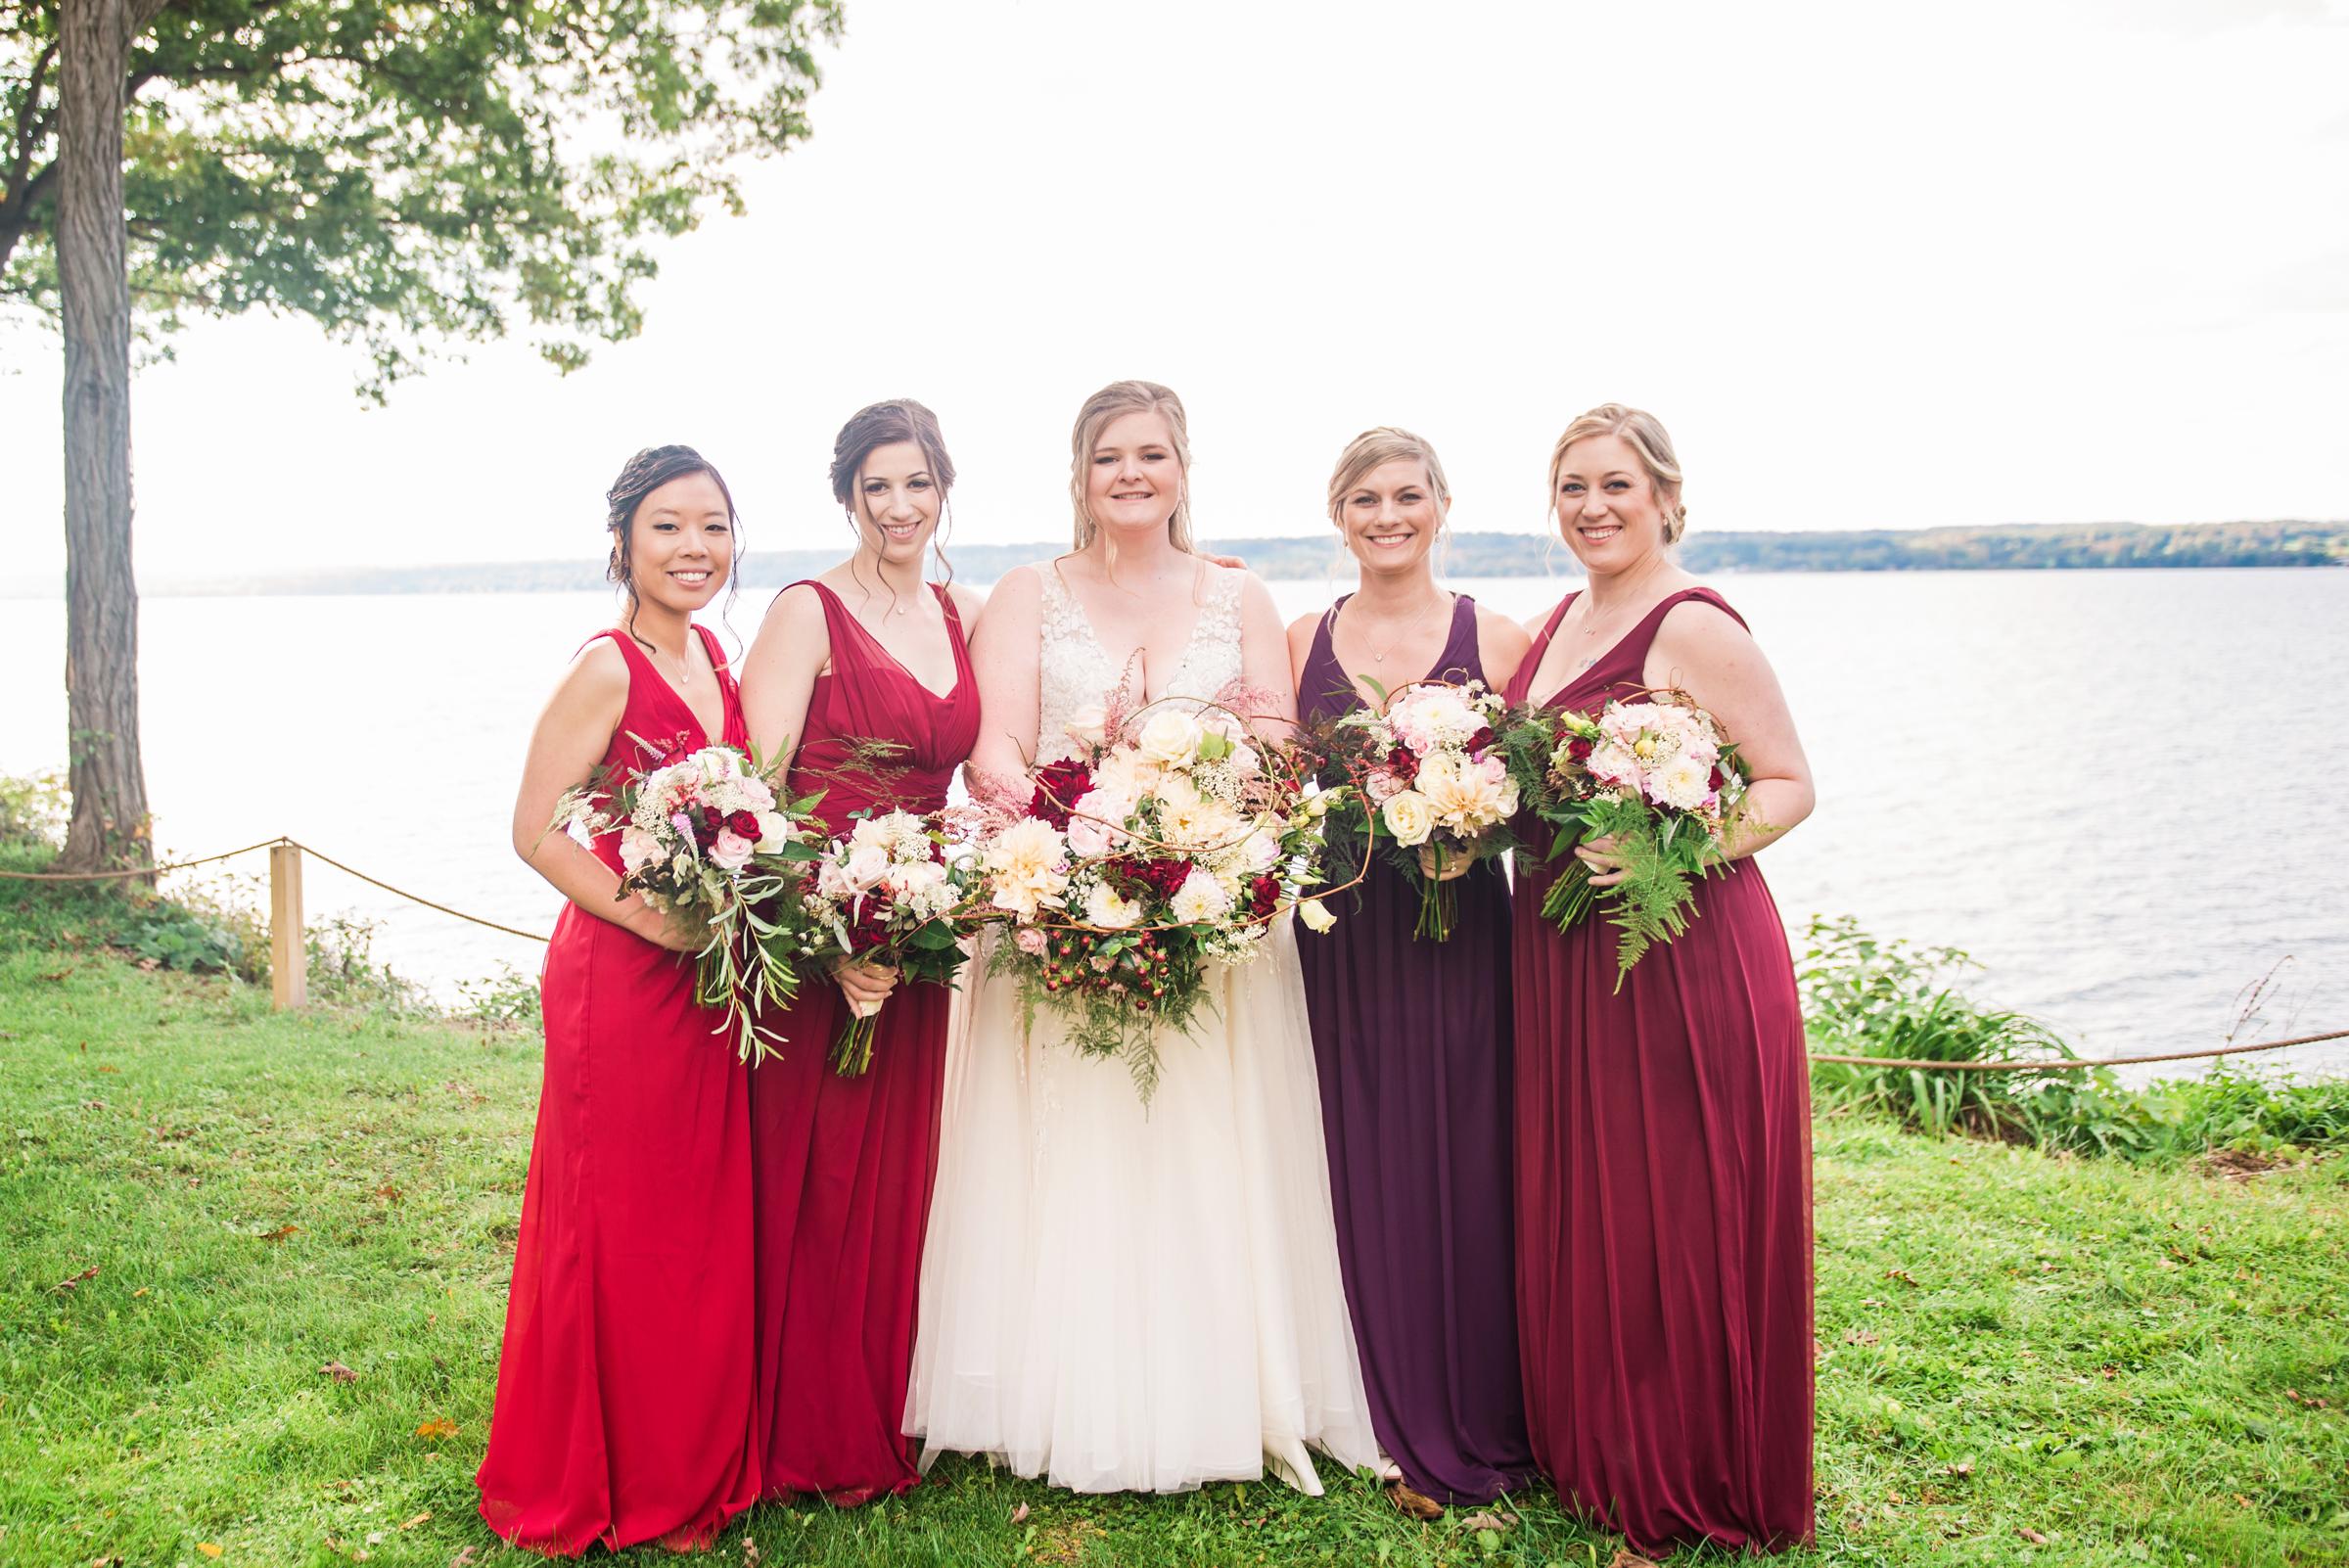 Zugibe_Vineyards_Finger_Lakes_Wedding_JILL_STUDIO_Rochester_NY_Photographer_DSC_3604.jpg